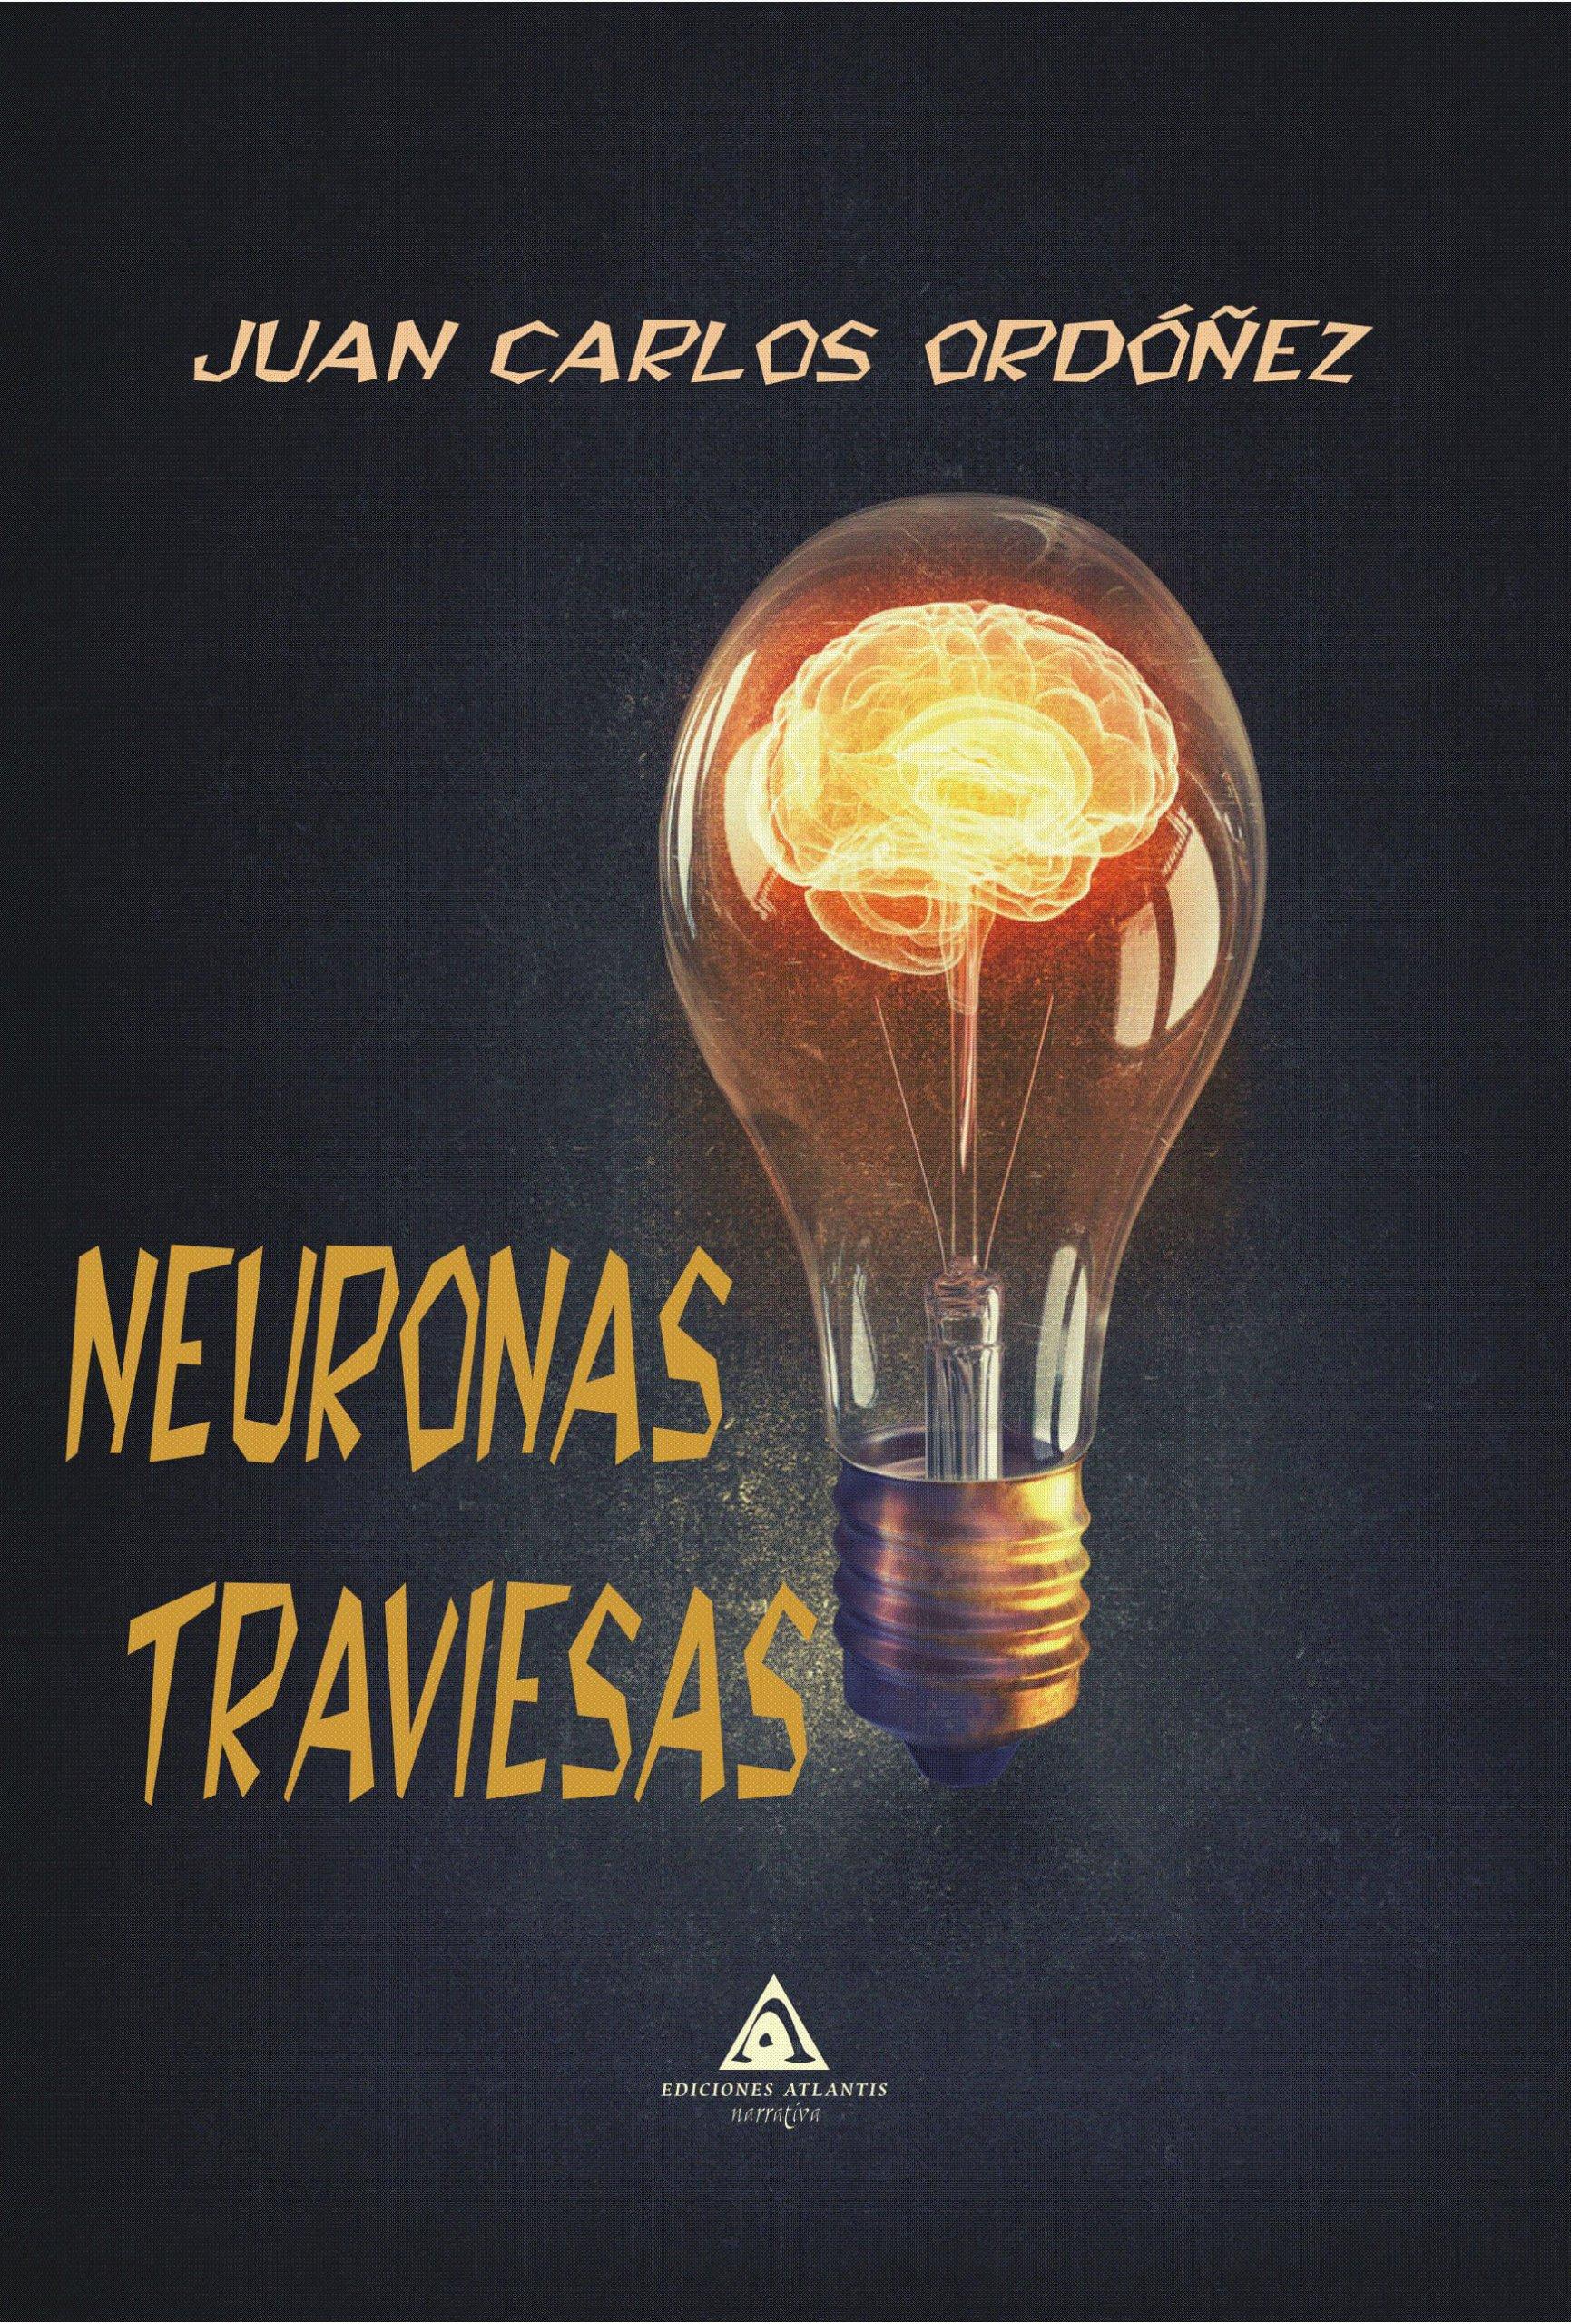 Neuronas traviesas, un libro de relatos escrito por Juan Carlos Ordóñez